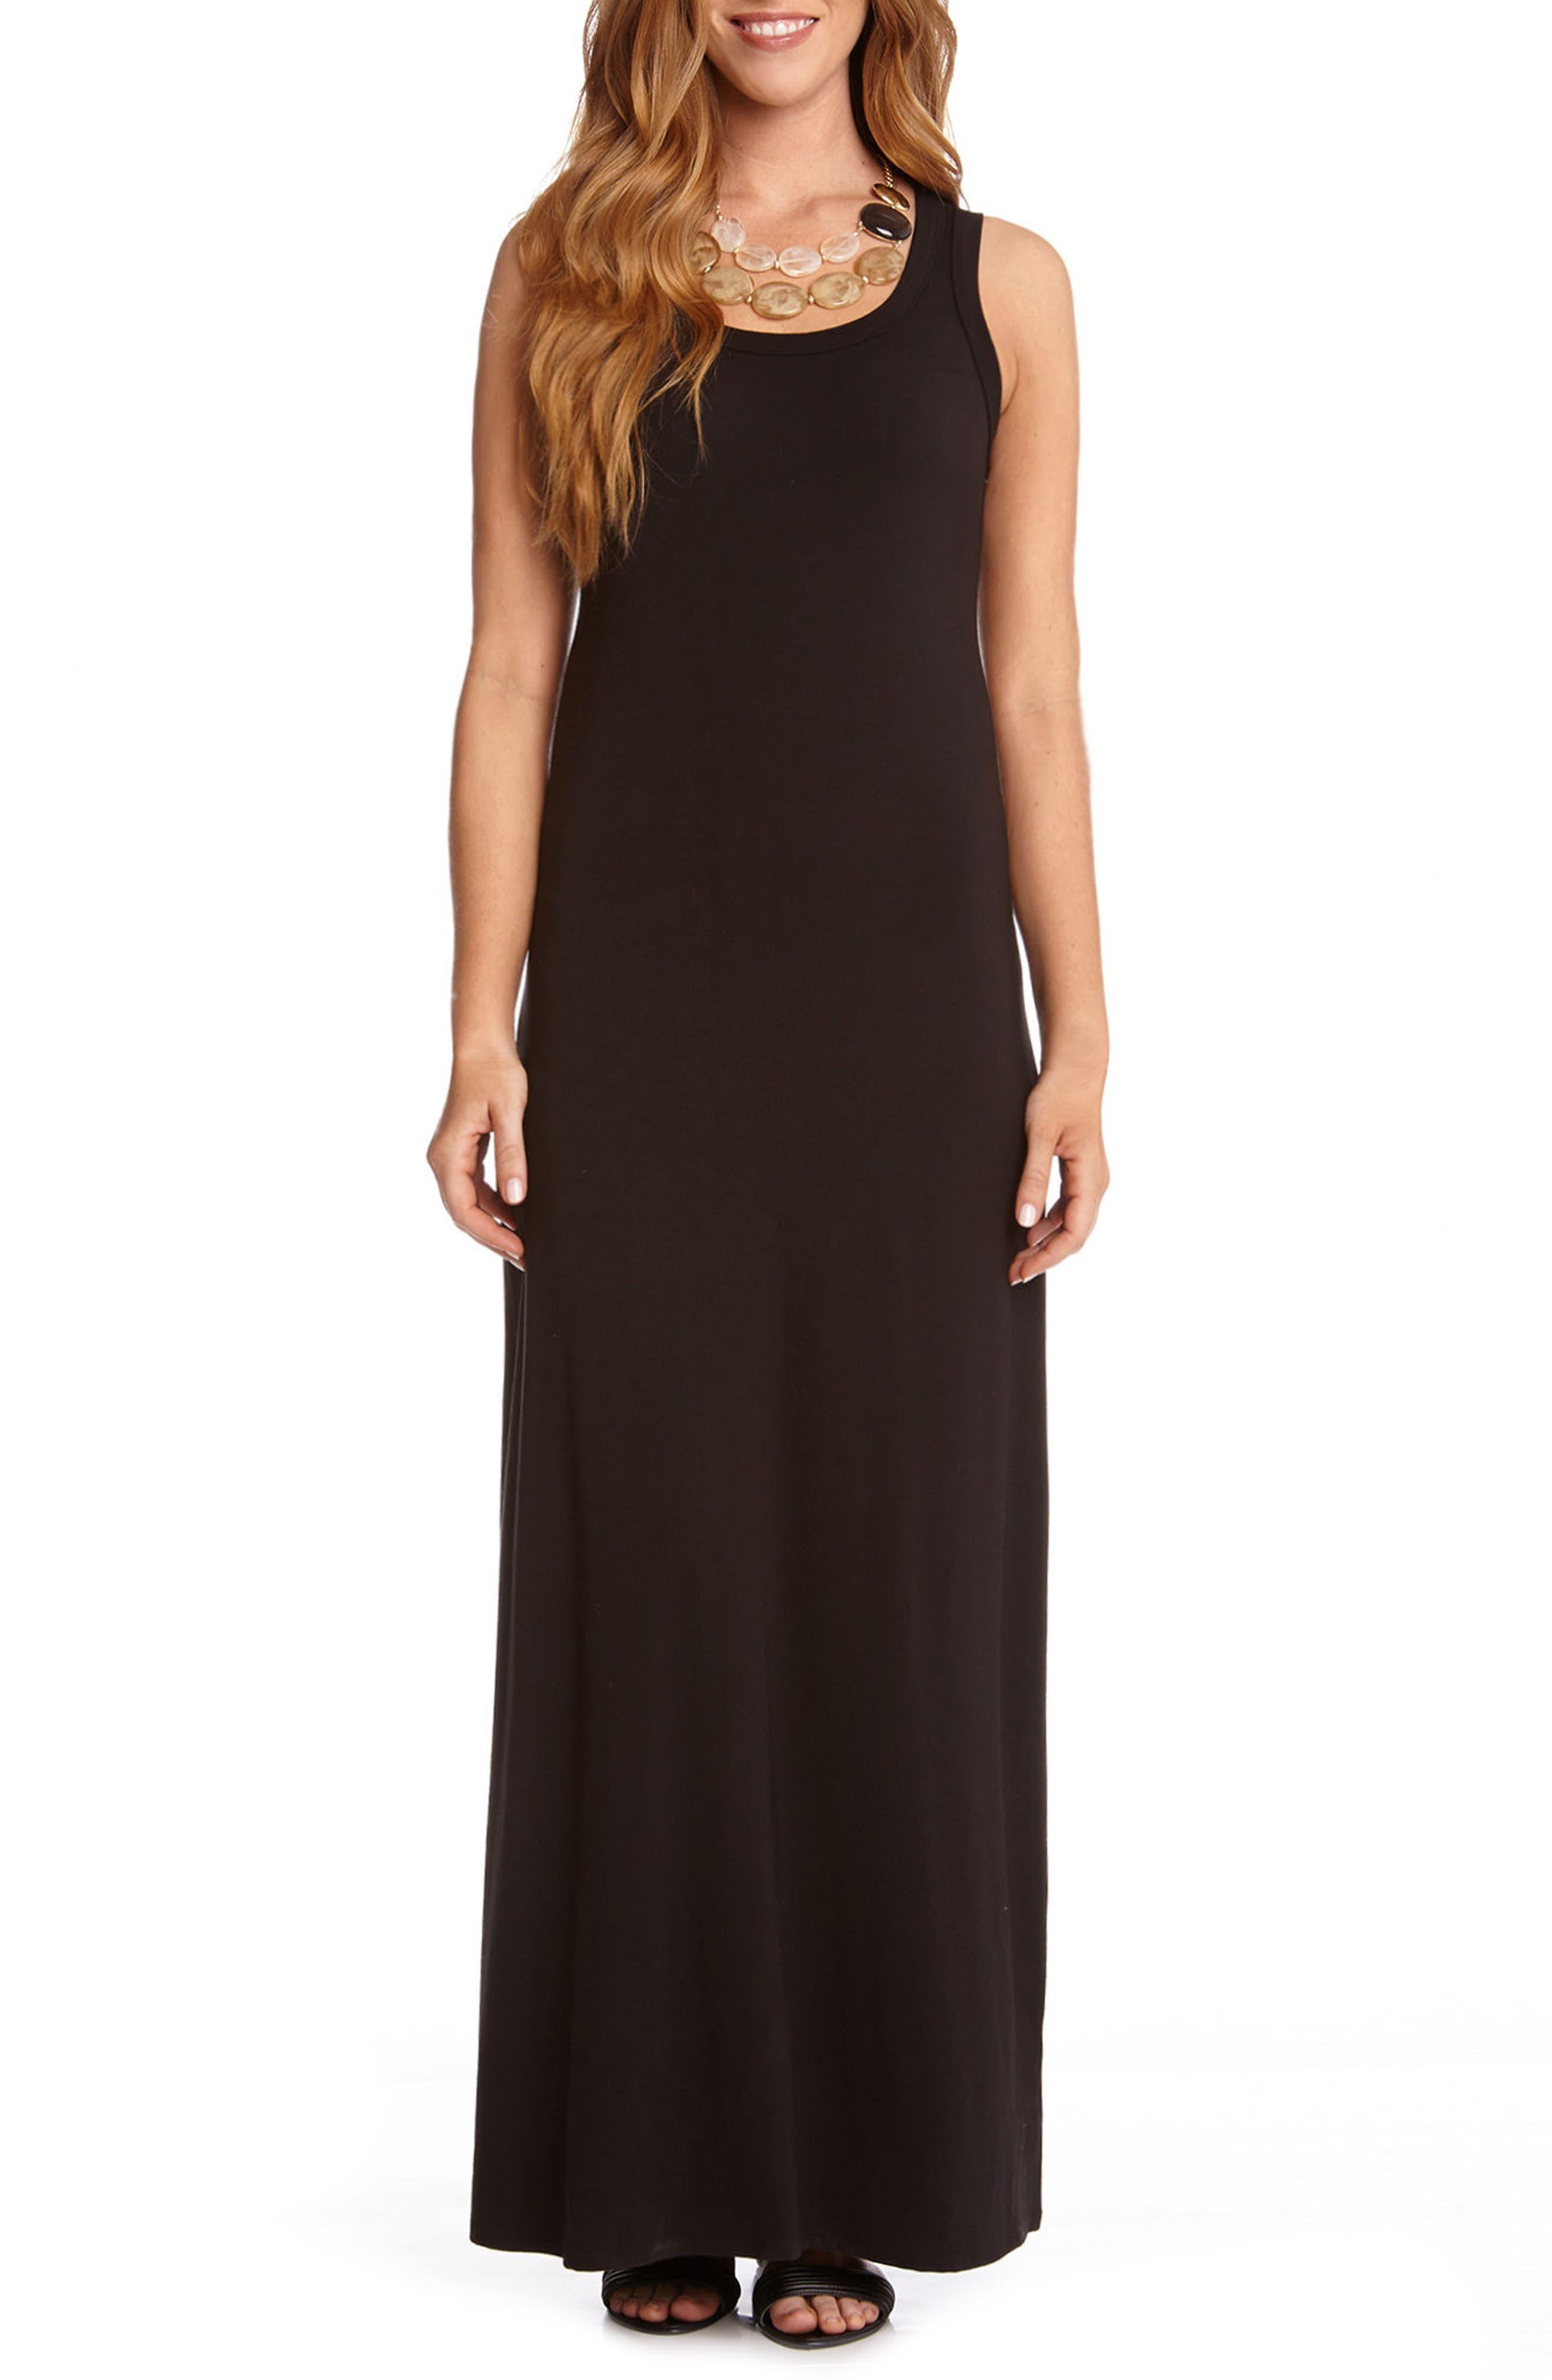 Maxi Tank Dress,                         Main,                         color, Black